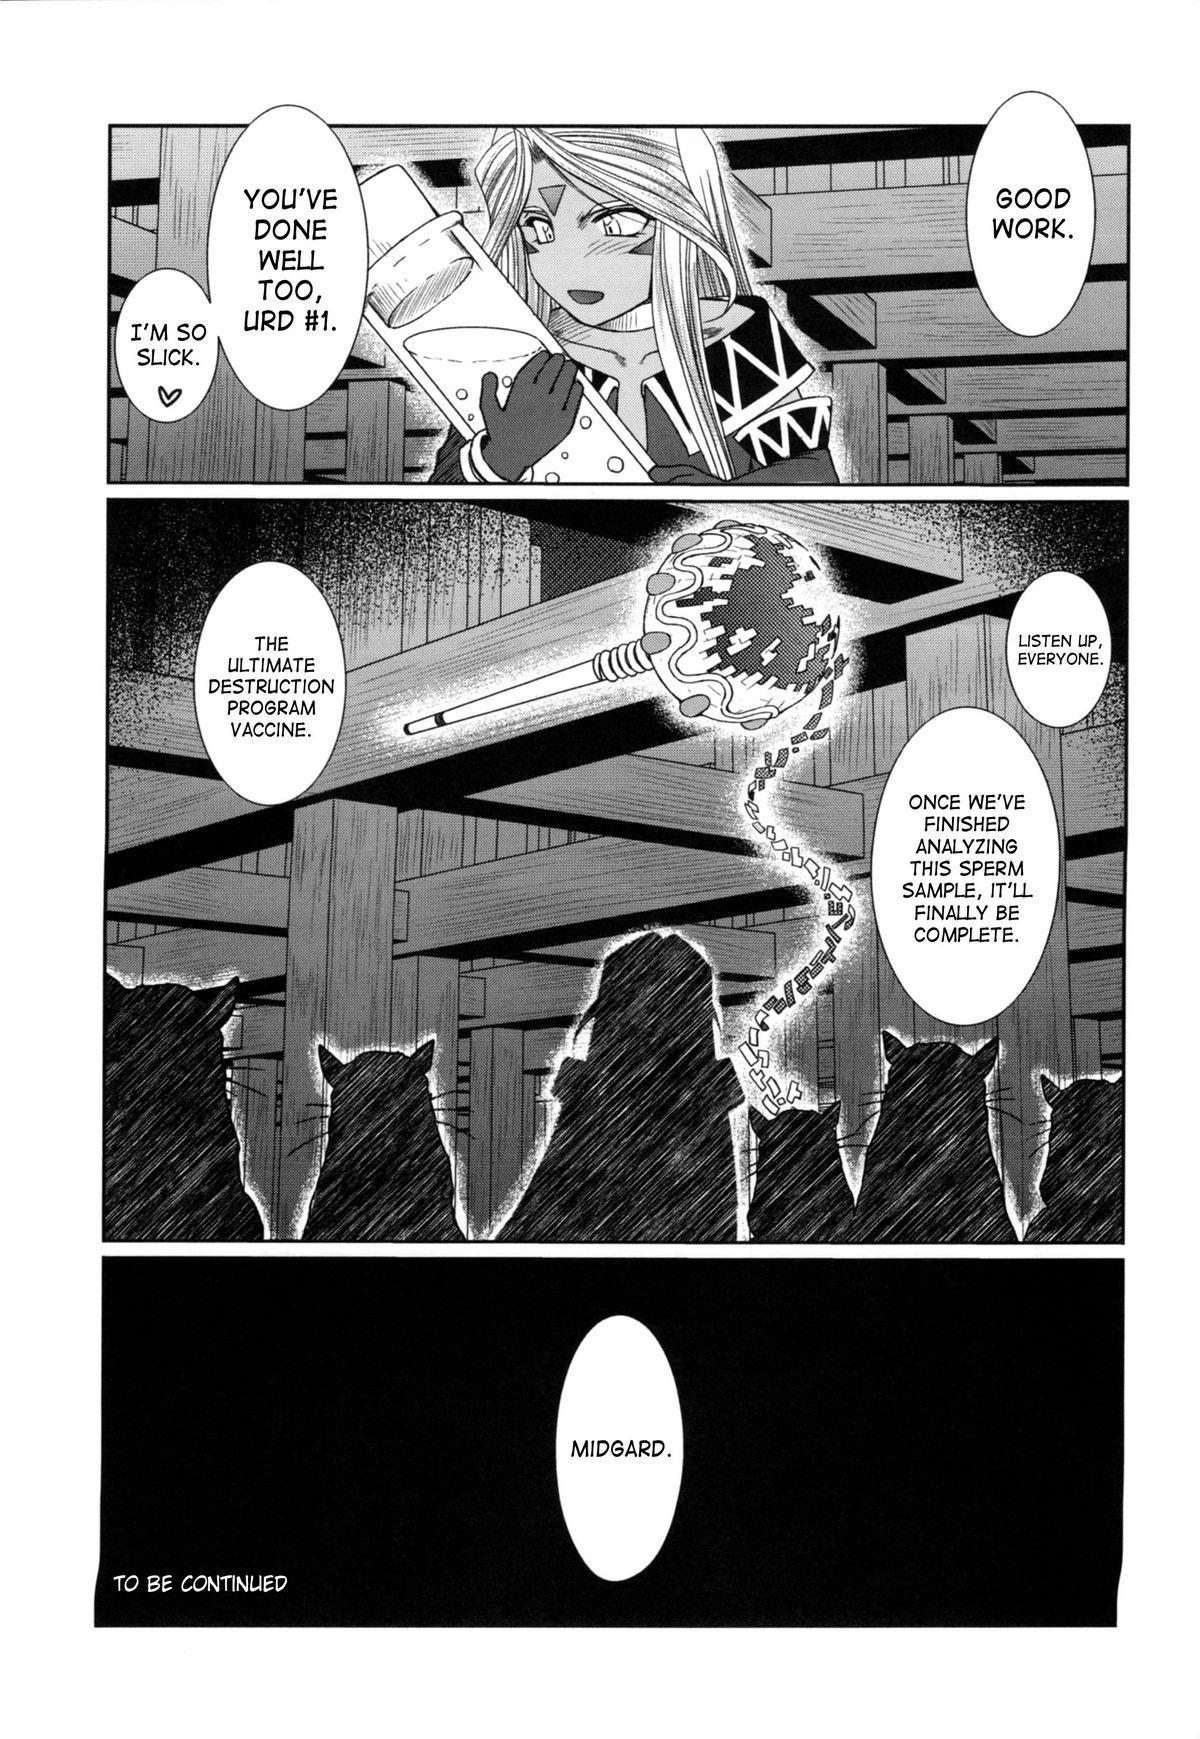 (C63) [CIRCLE OUTERWORLD (Chiba Shuusaku)] Midgard  (Ah! My Goddess) complete [eng] 442